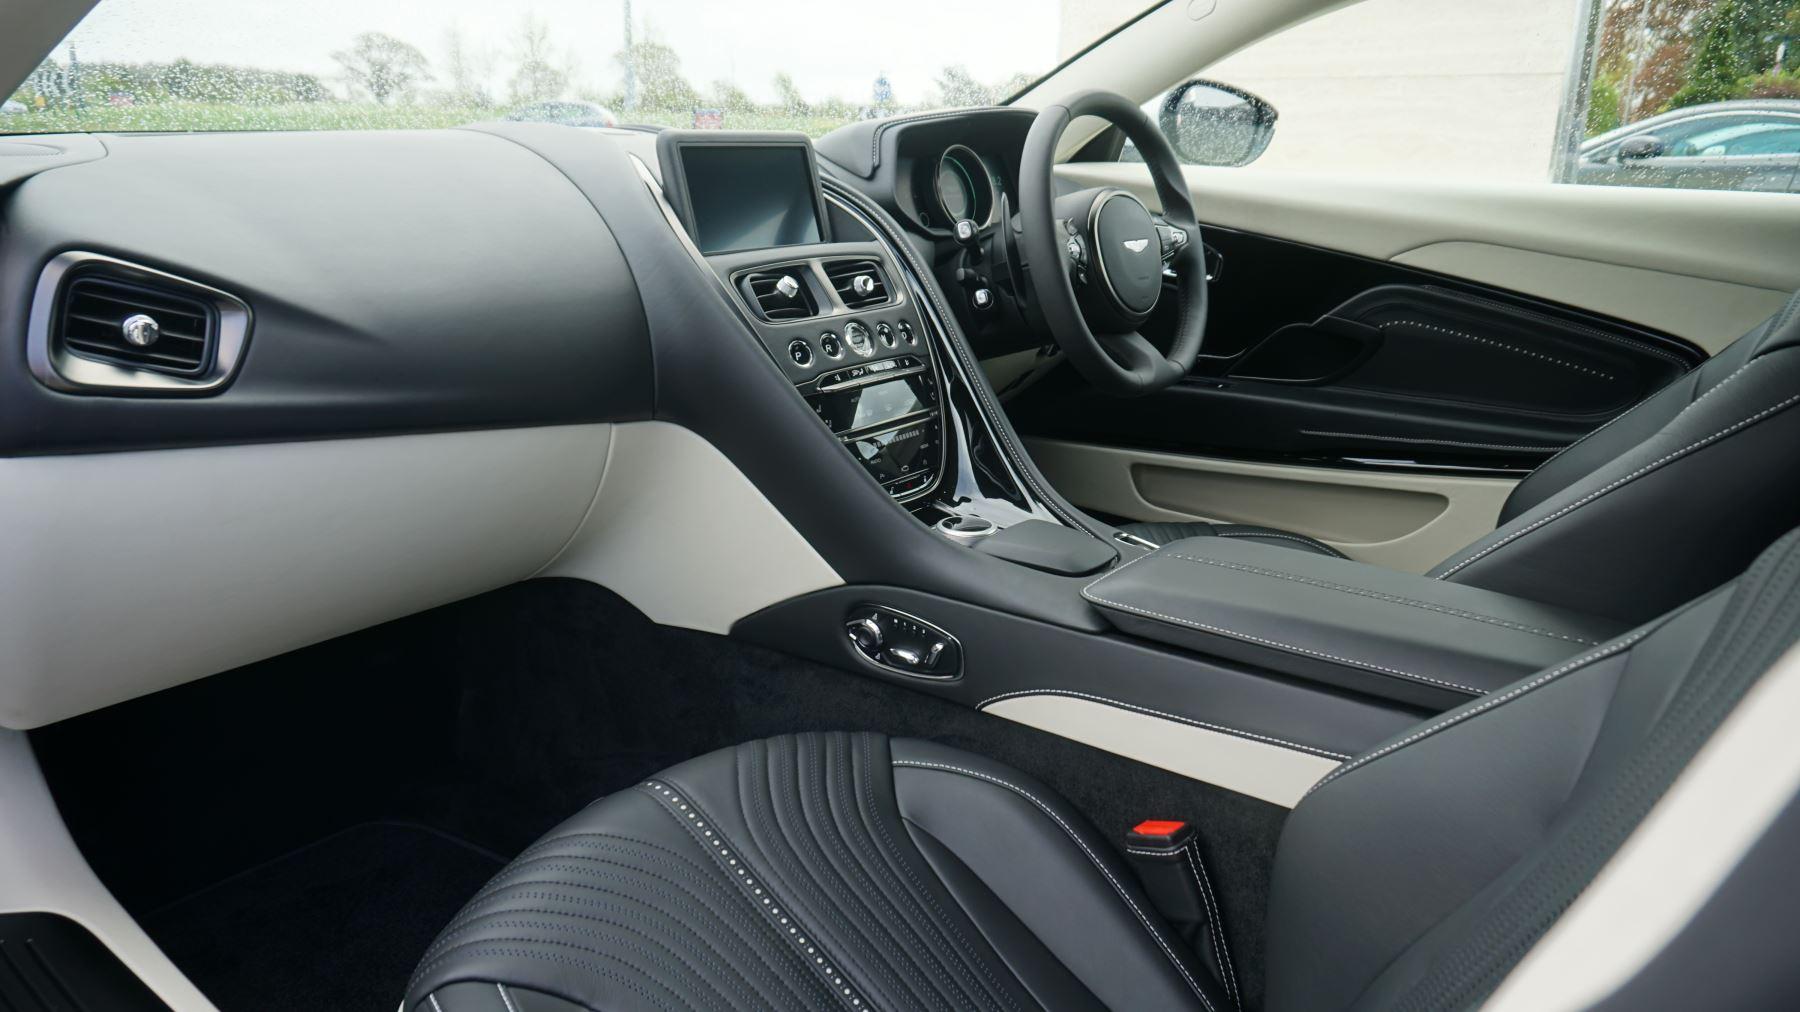 Aston Martin DB11 V12 2dr Touchtronic image 11